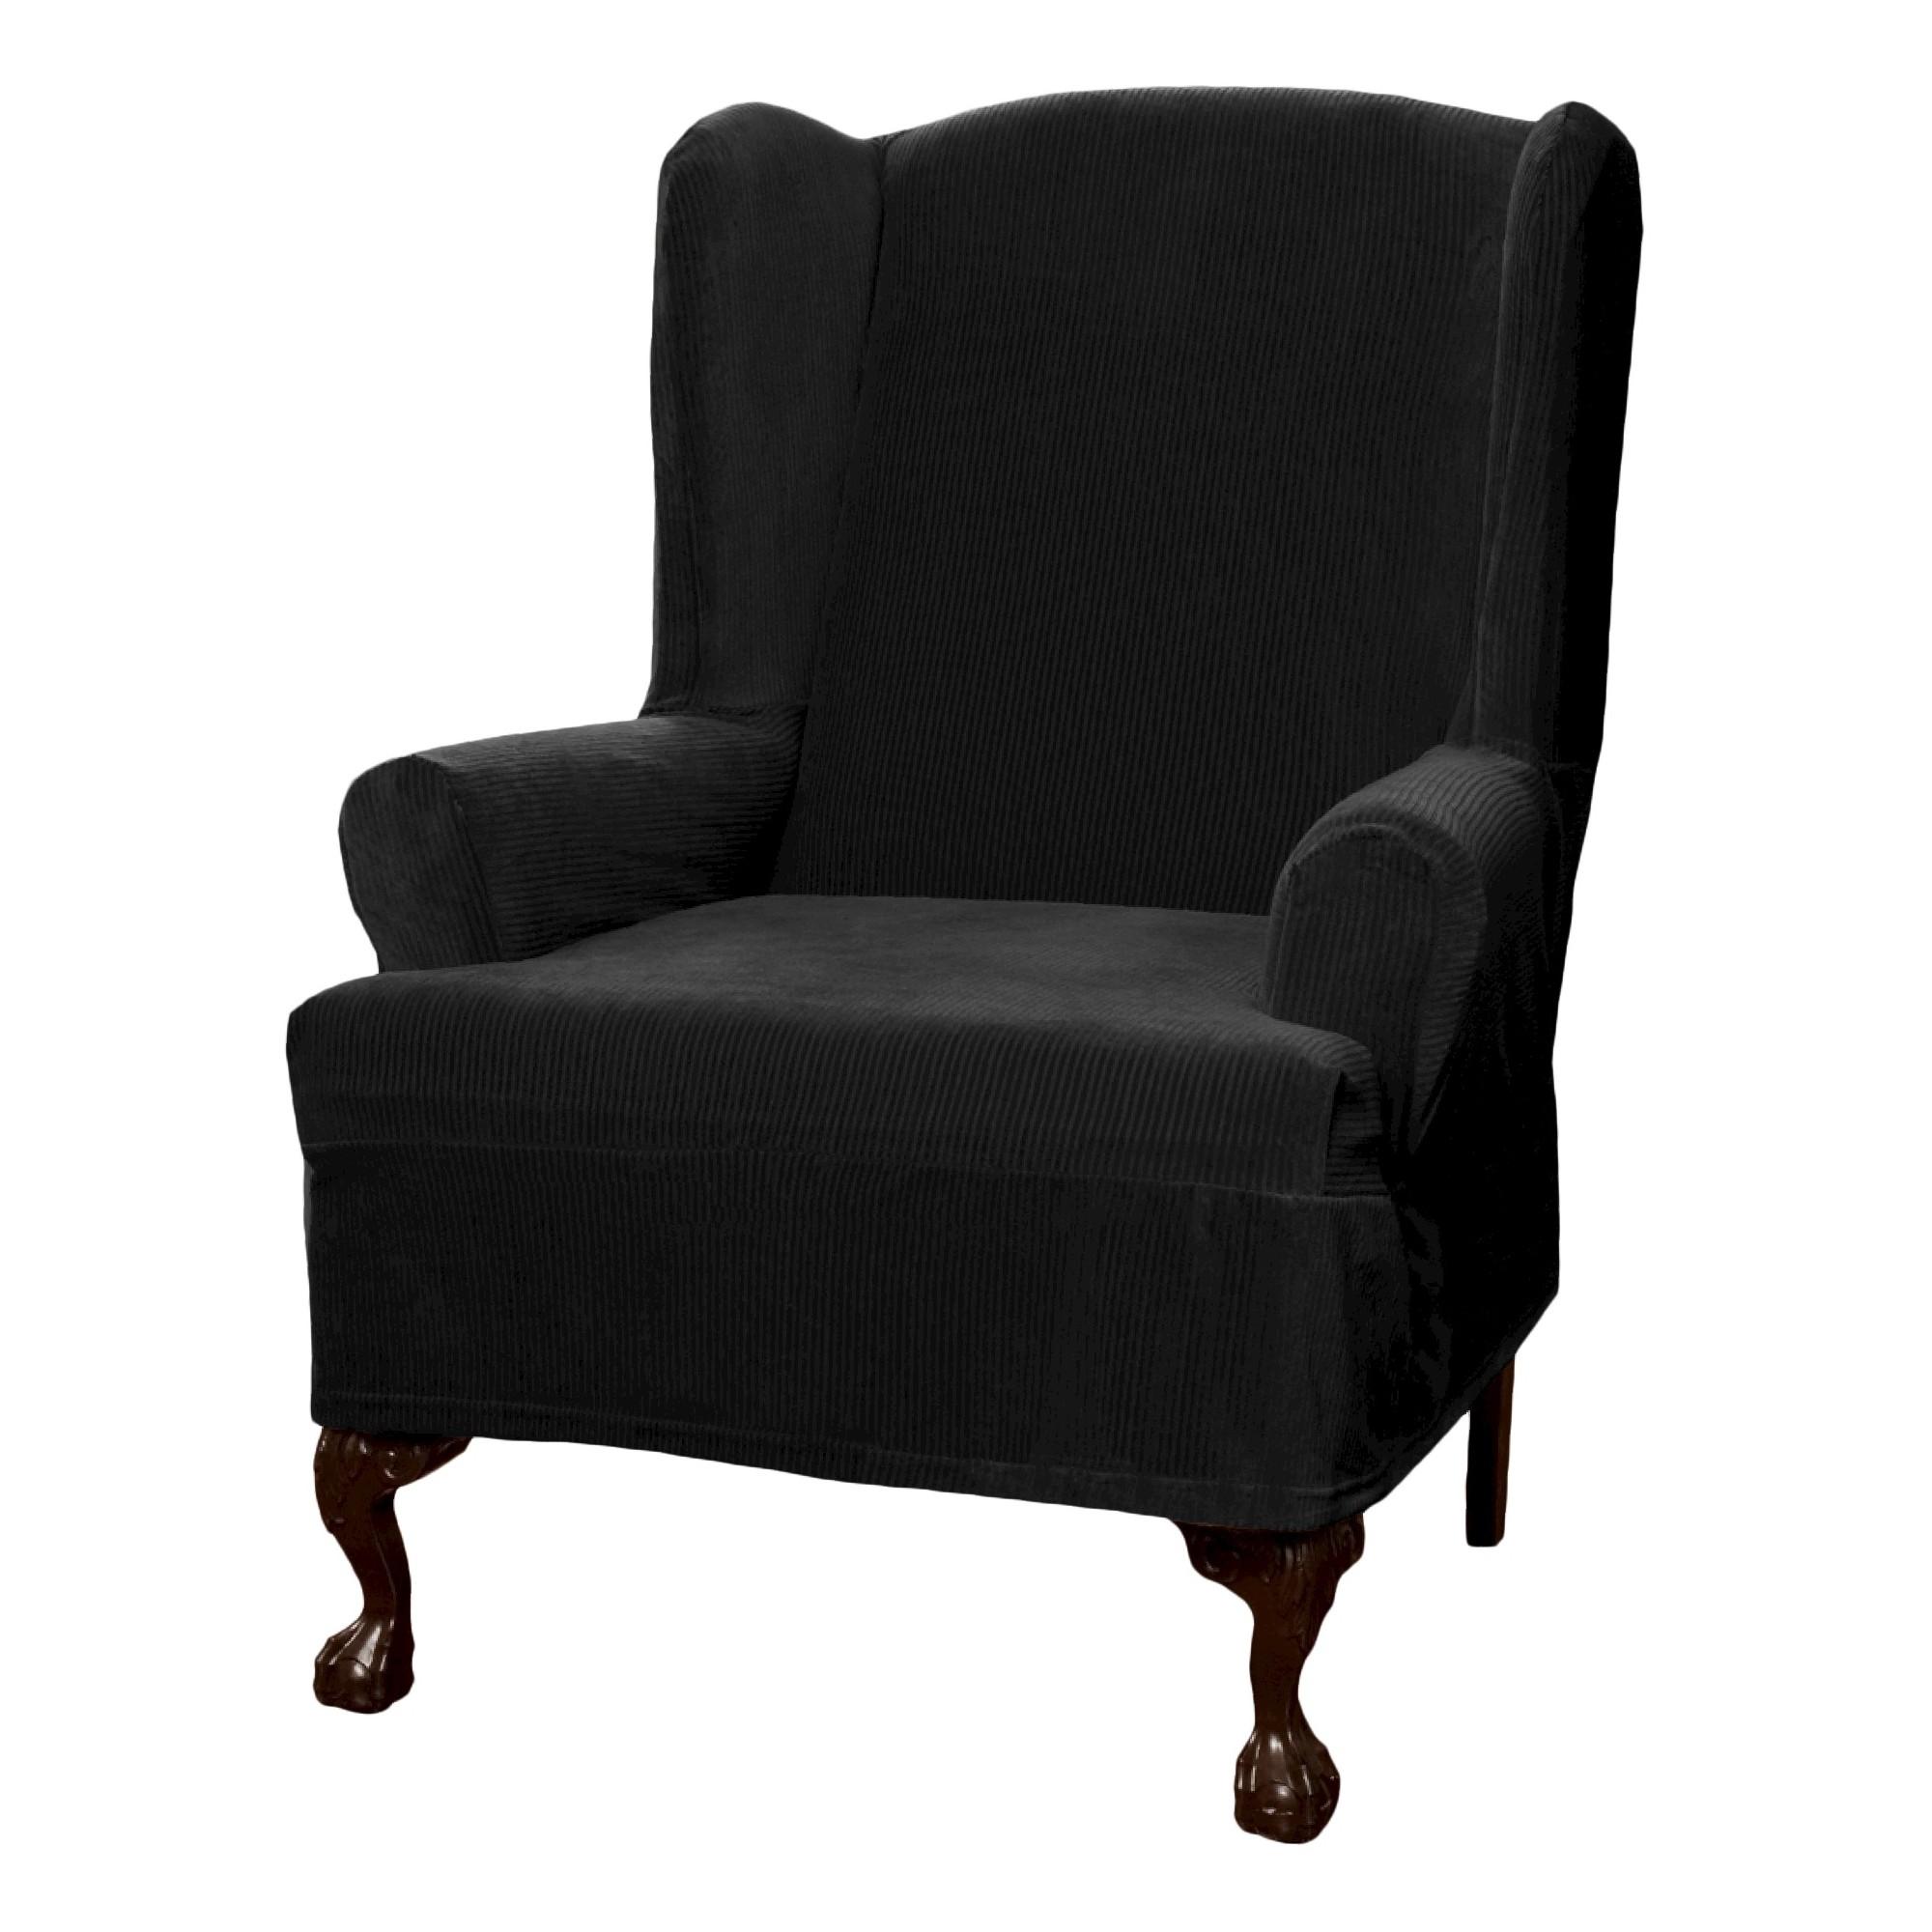 Black Collin Stretch Wingchair Slipcover Maytex